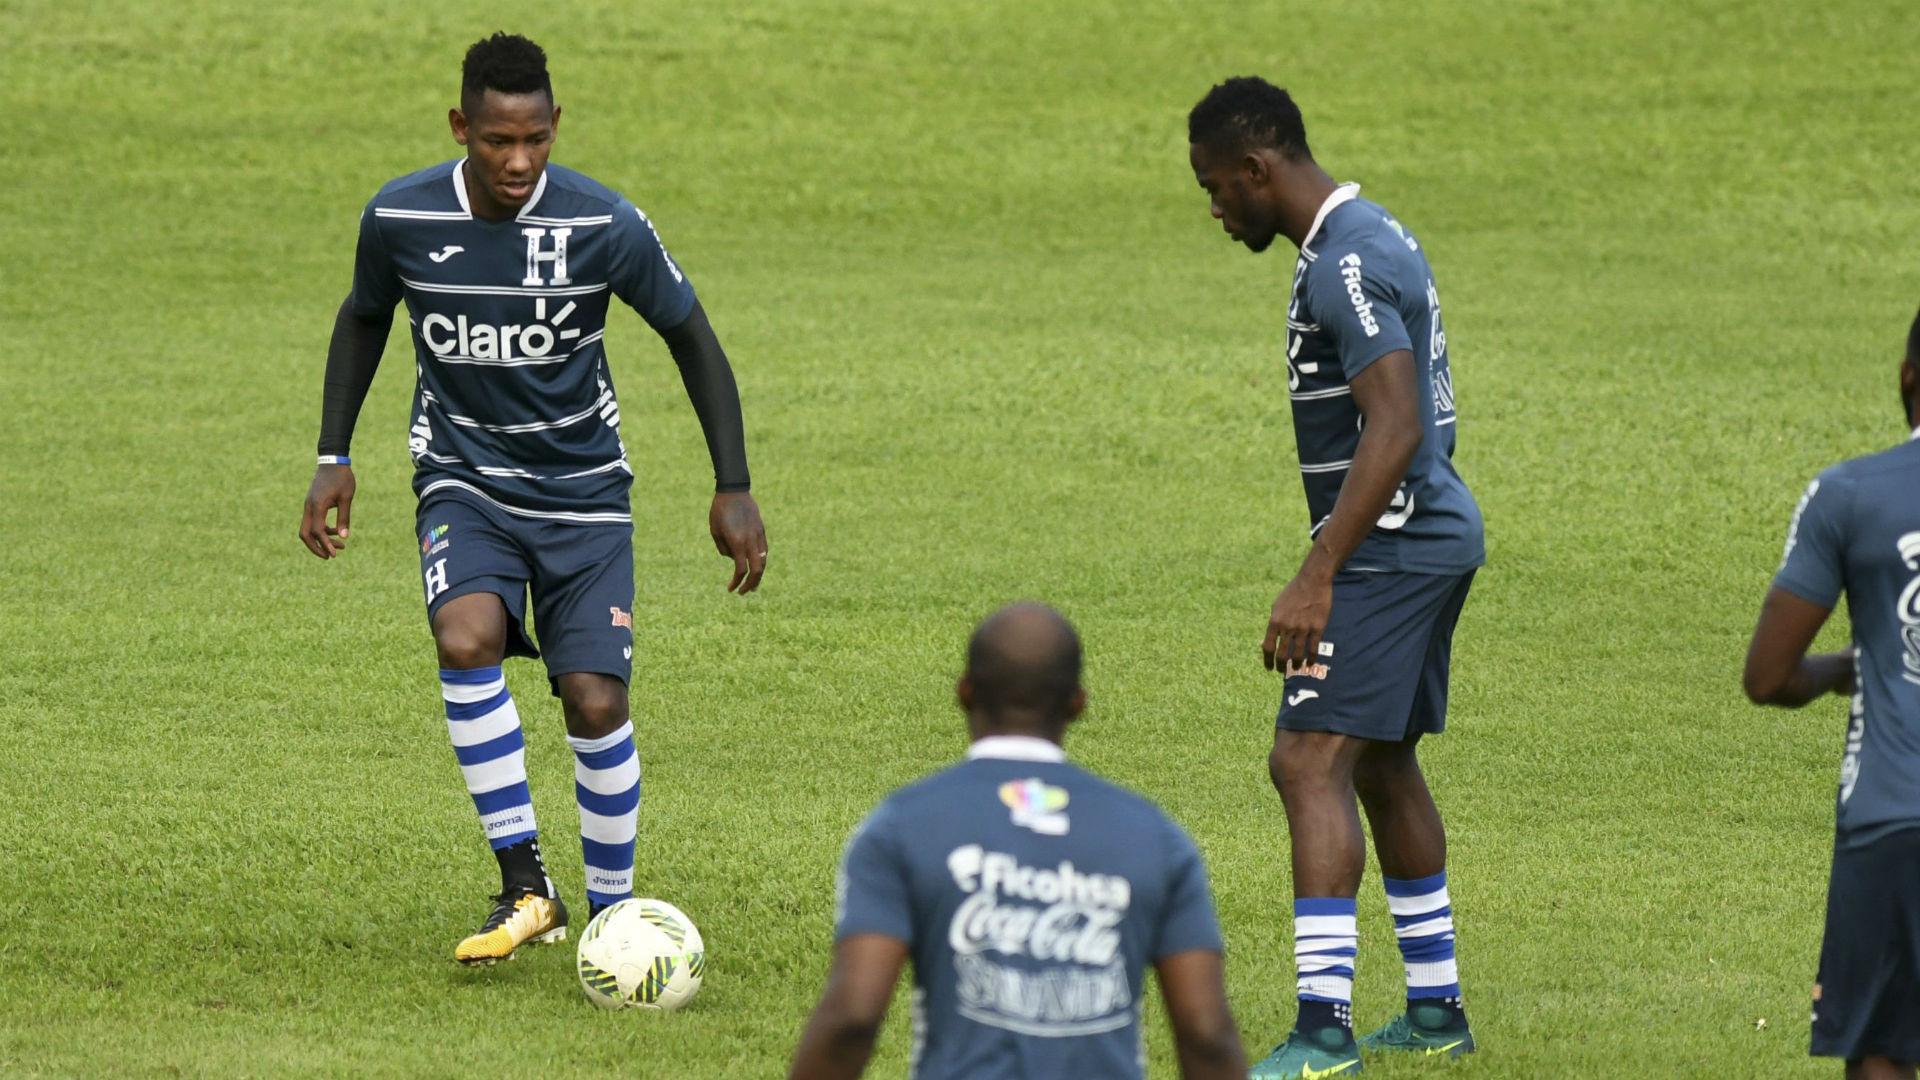 Honduras training